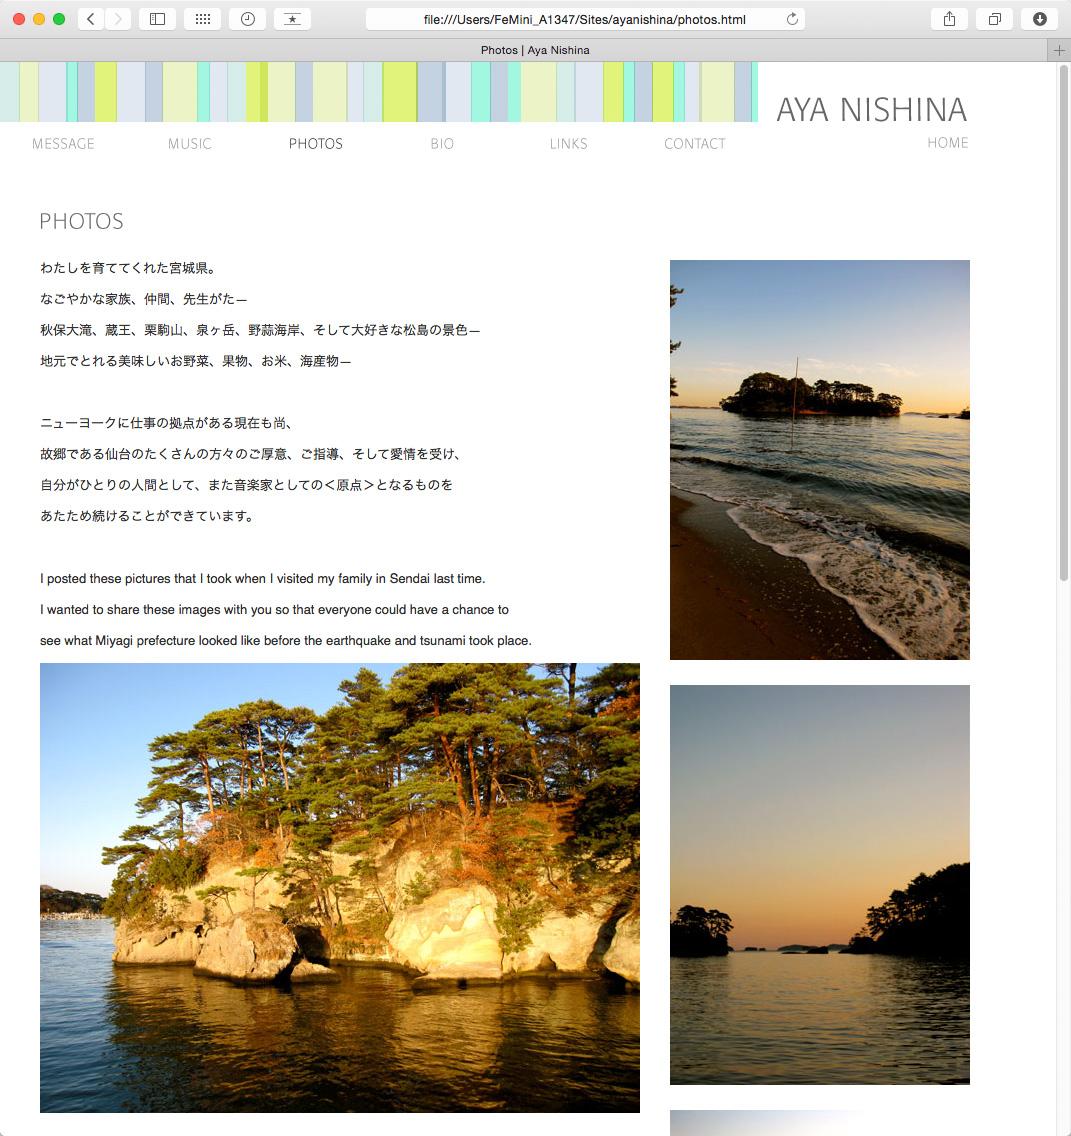 Aya Nishina